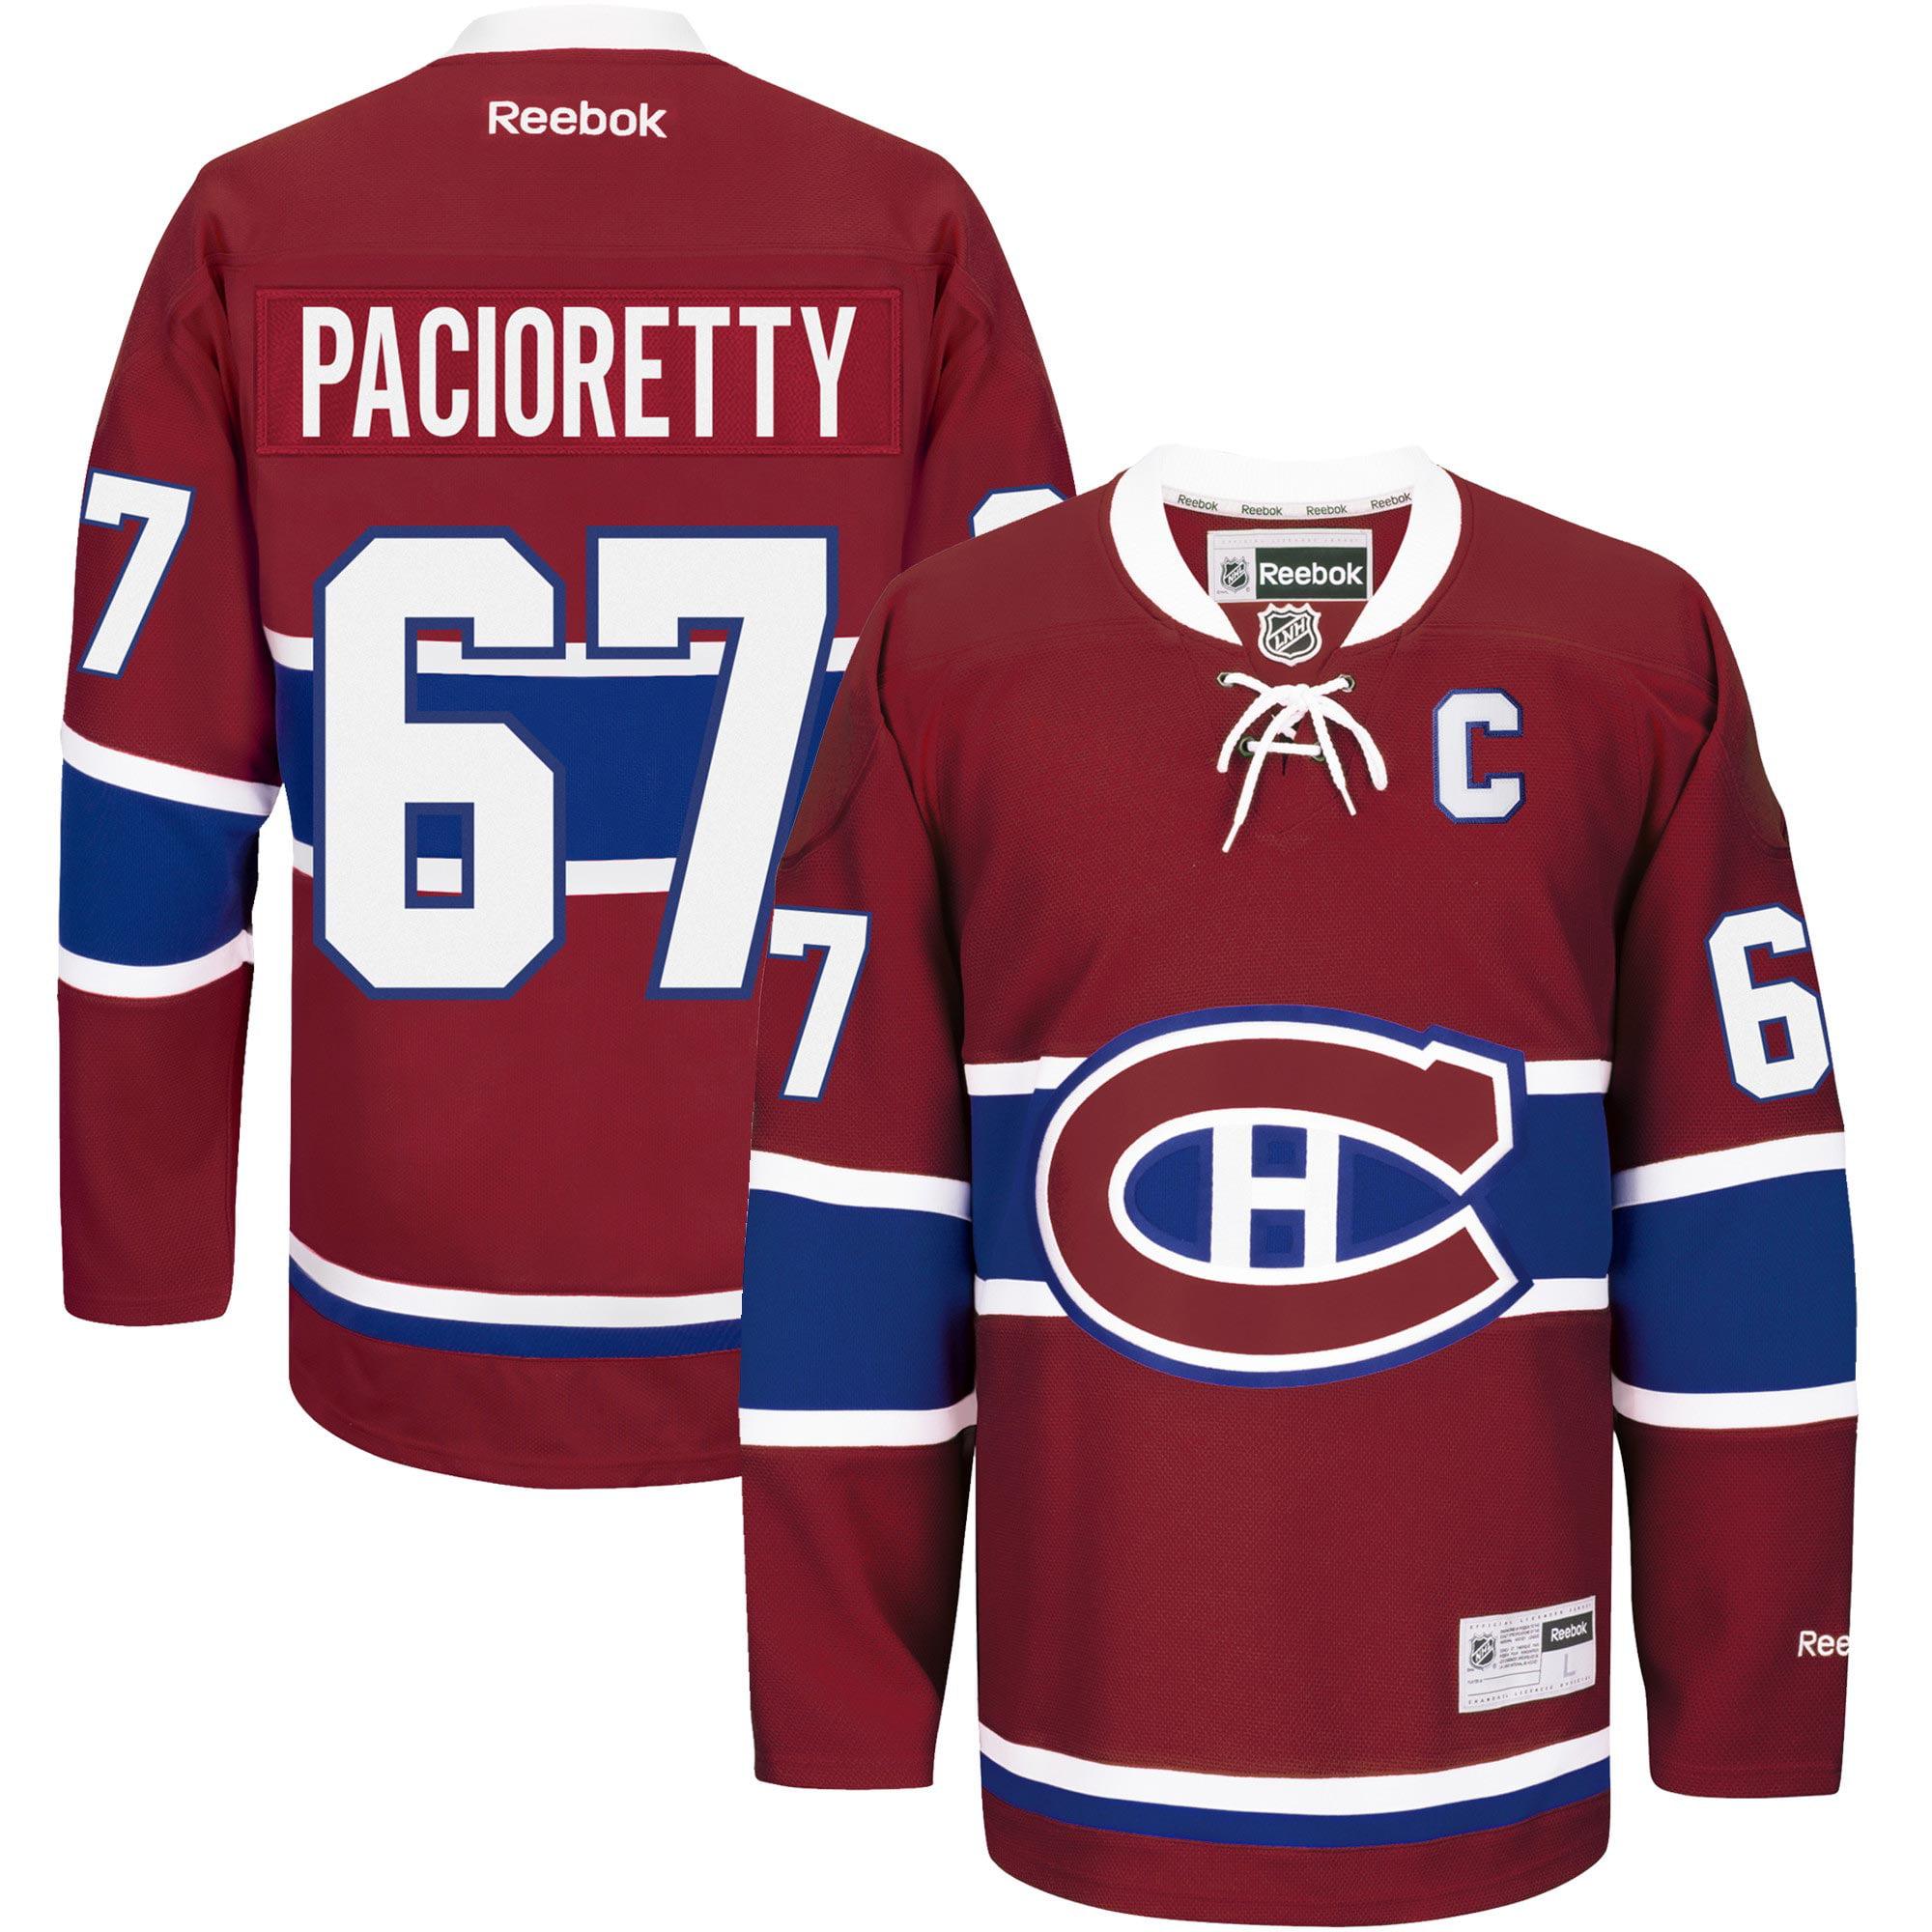 ... australia max pacioretty montreal canadiens reebok premier player home  jersey red walmart 1a7a1 7da30 35a985f0f